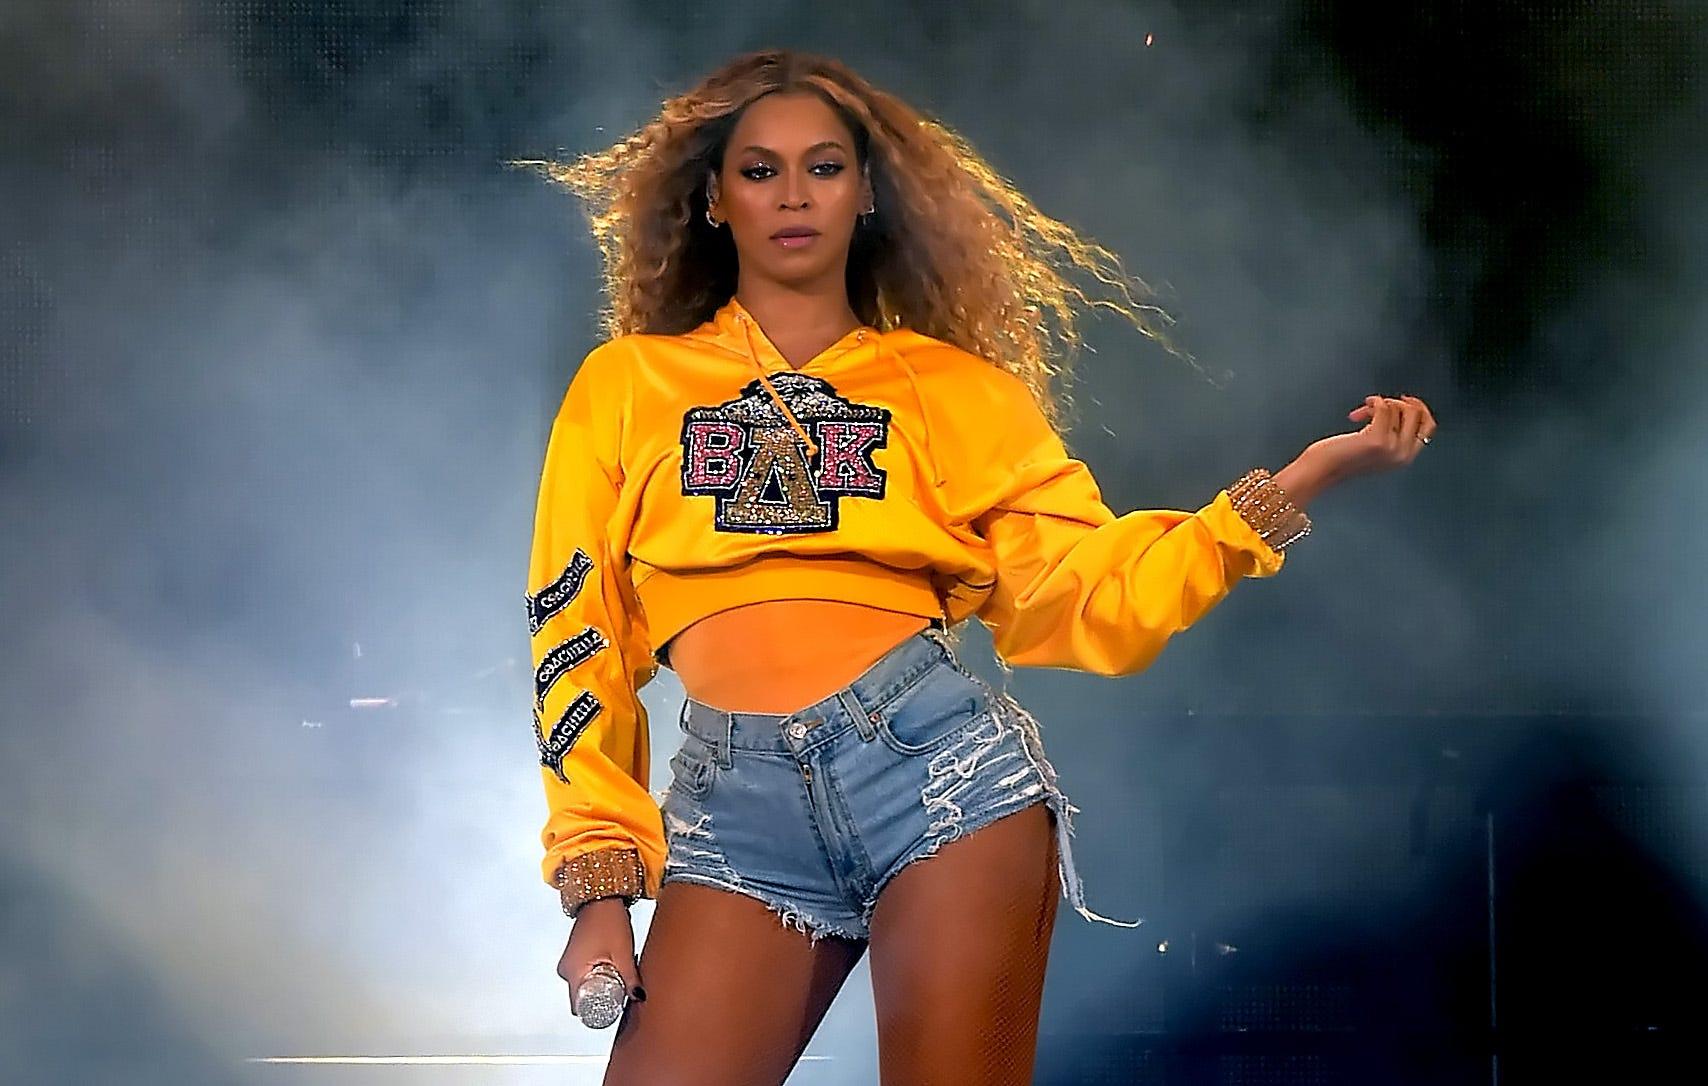 Beyoncé reunites Destiny's Child in Internet-breaking Coachella performance